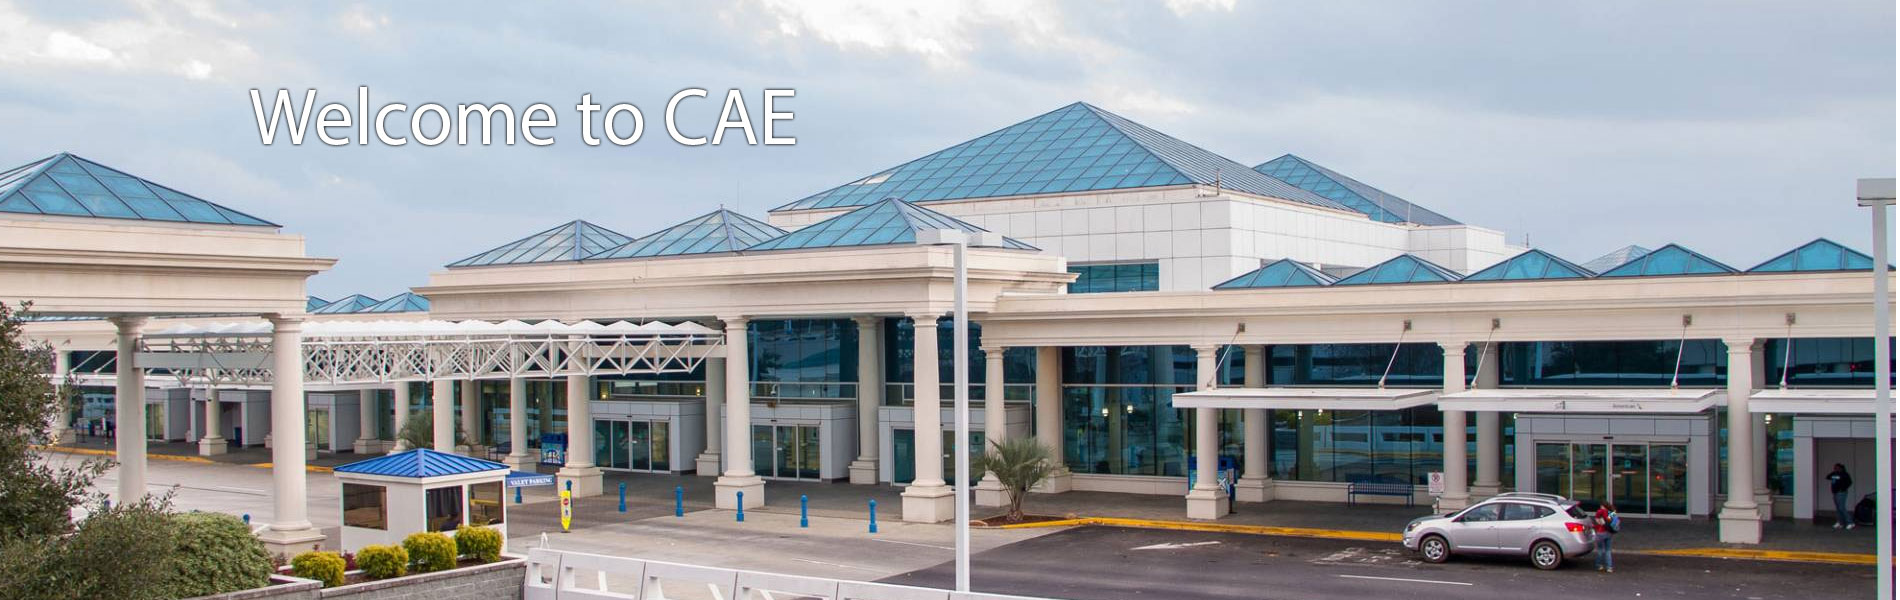 (CAE) - Columbia Metropolitan Airport Shuttle